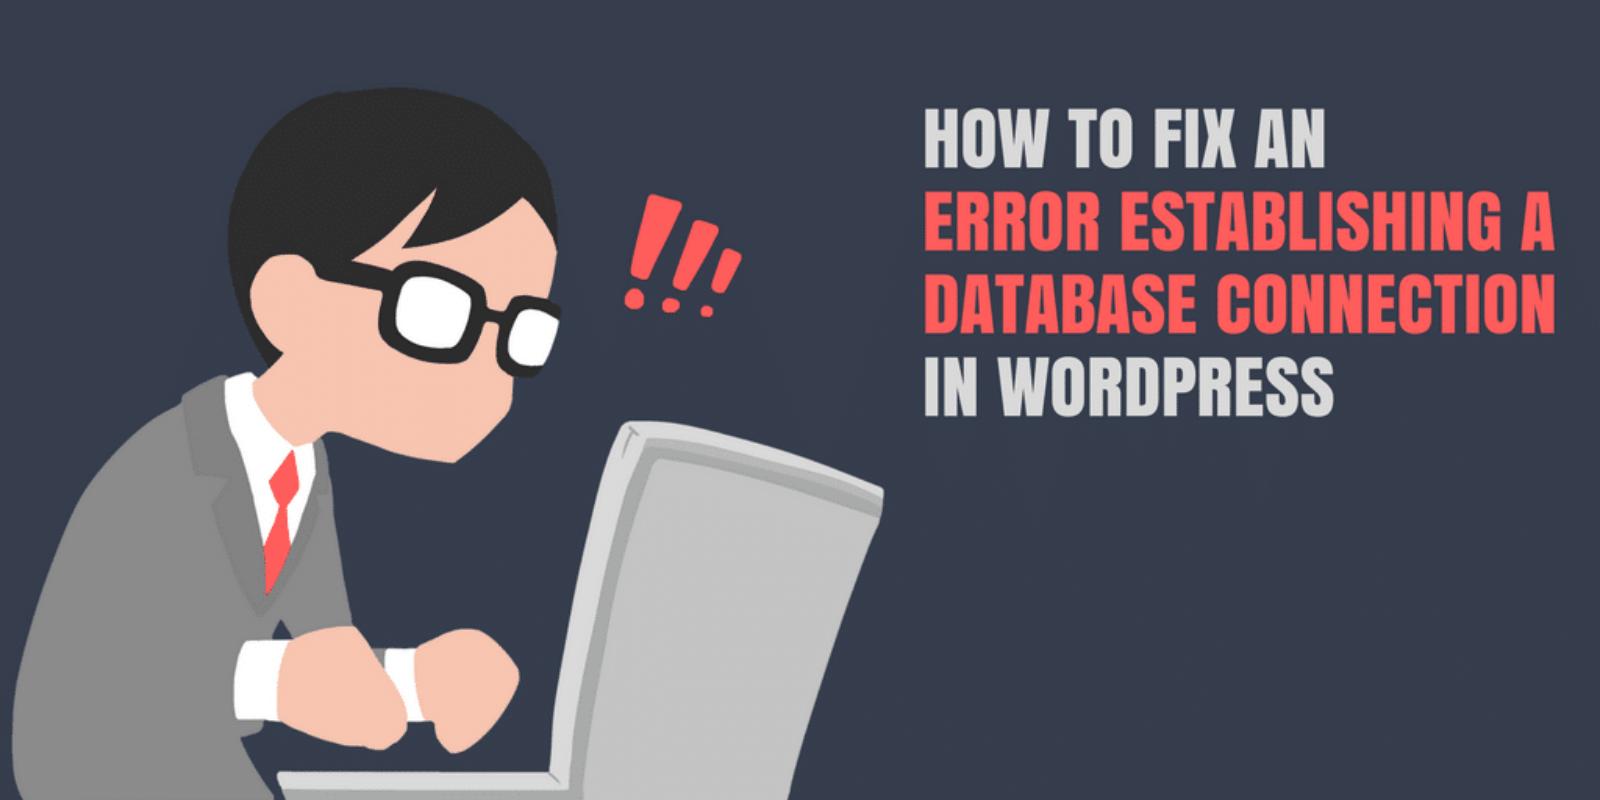 Fix the Error Establishing a Database Connection in WordPress